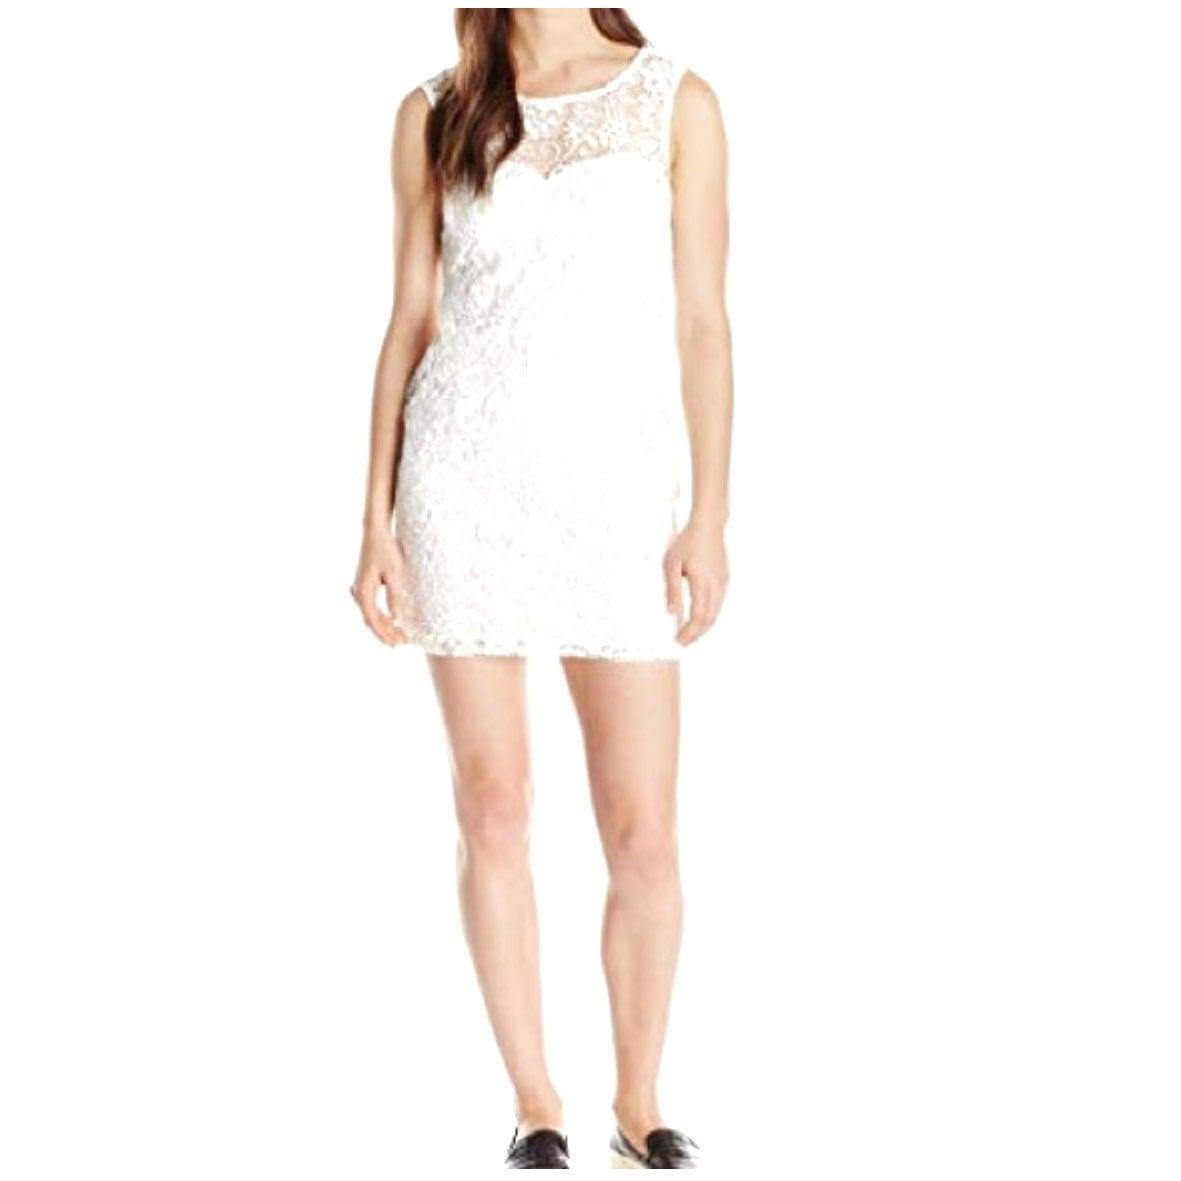 Macys As U Wish White Lace Midi Dress